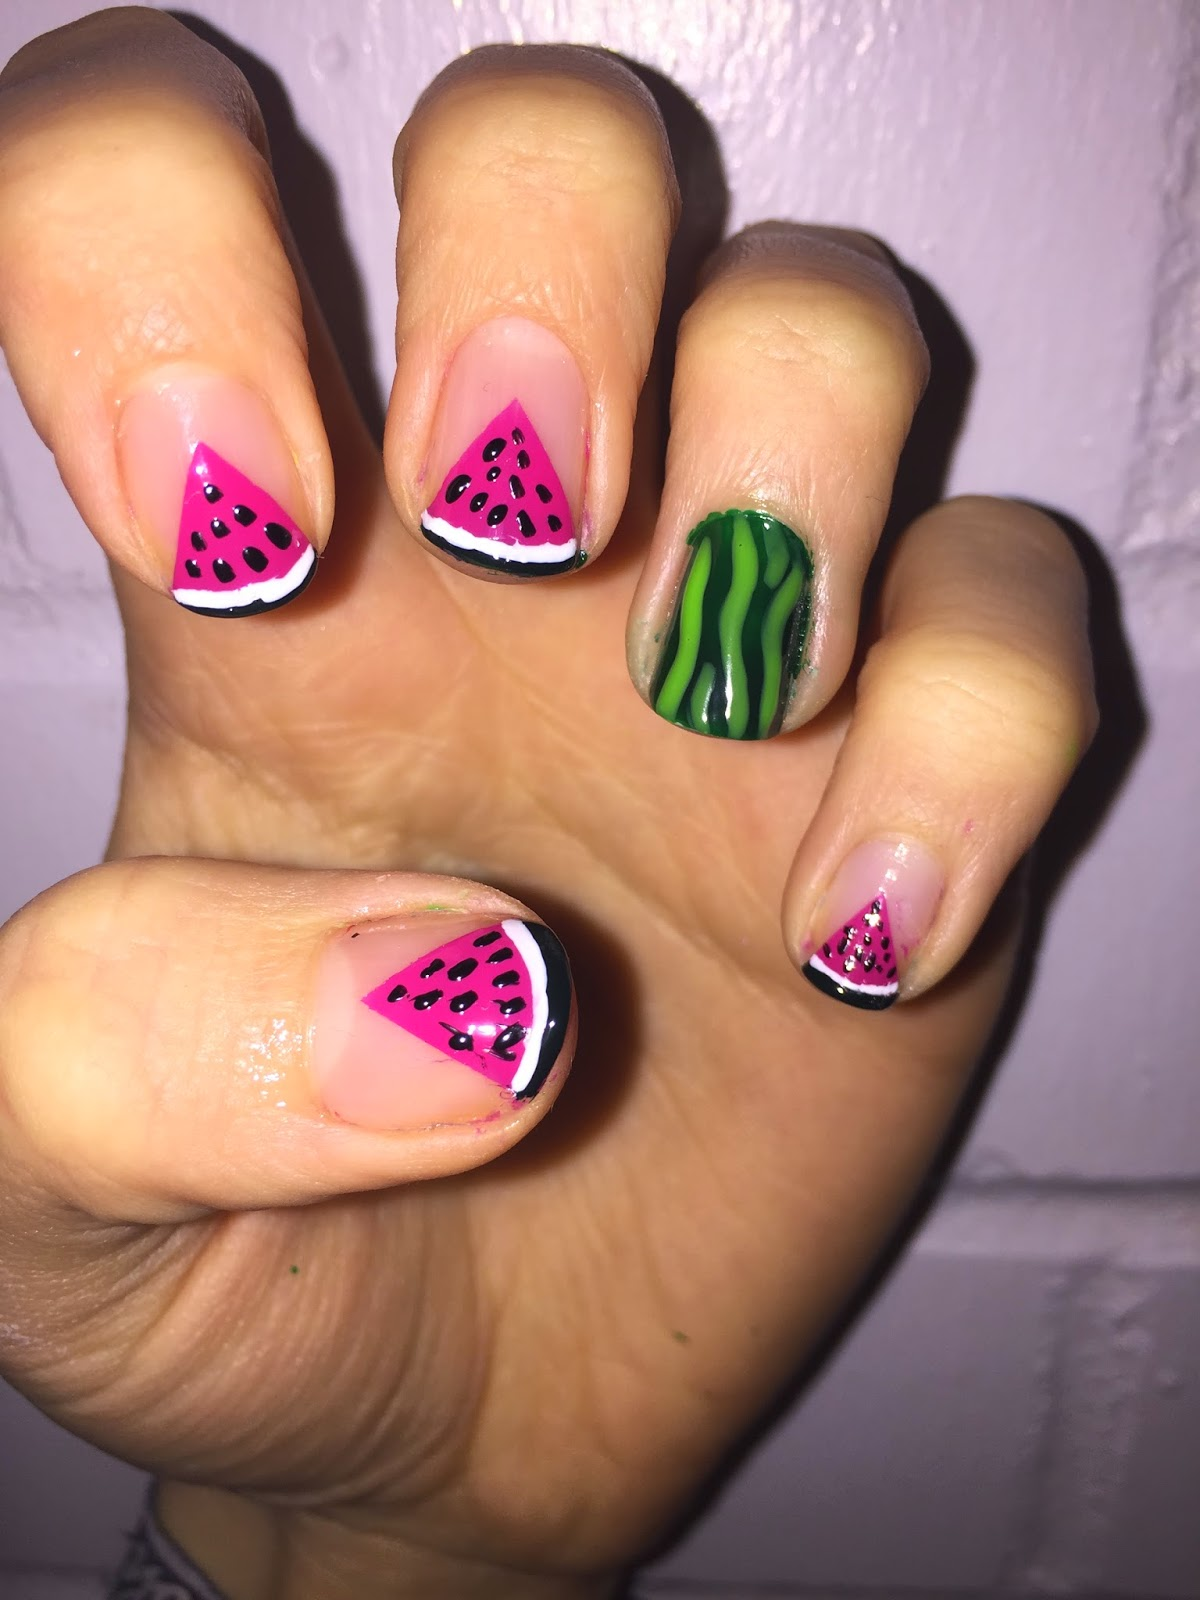 Laras Nails Negative Space Watermelon Nail Art Tutorial